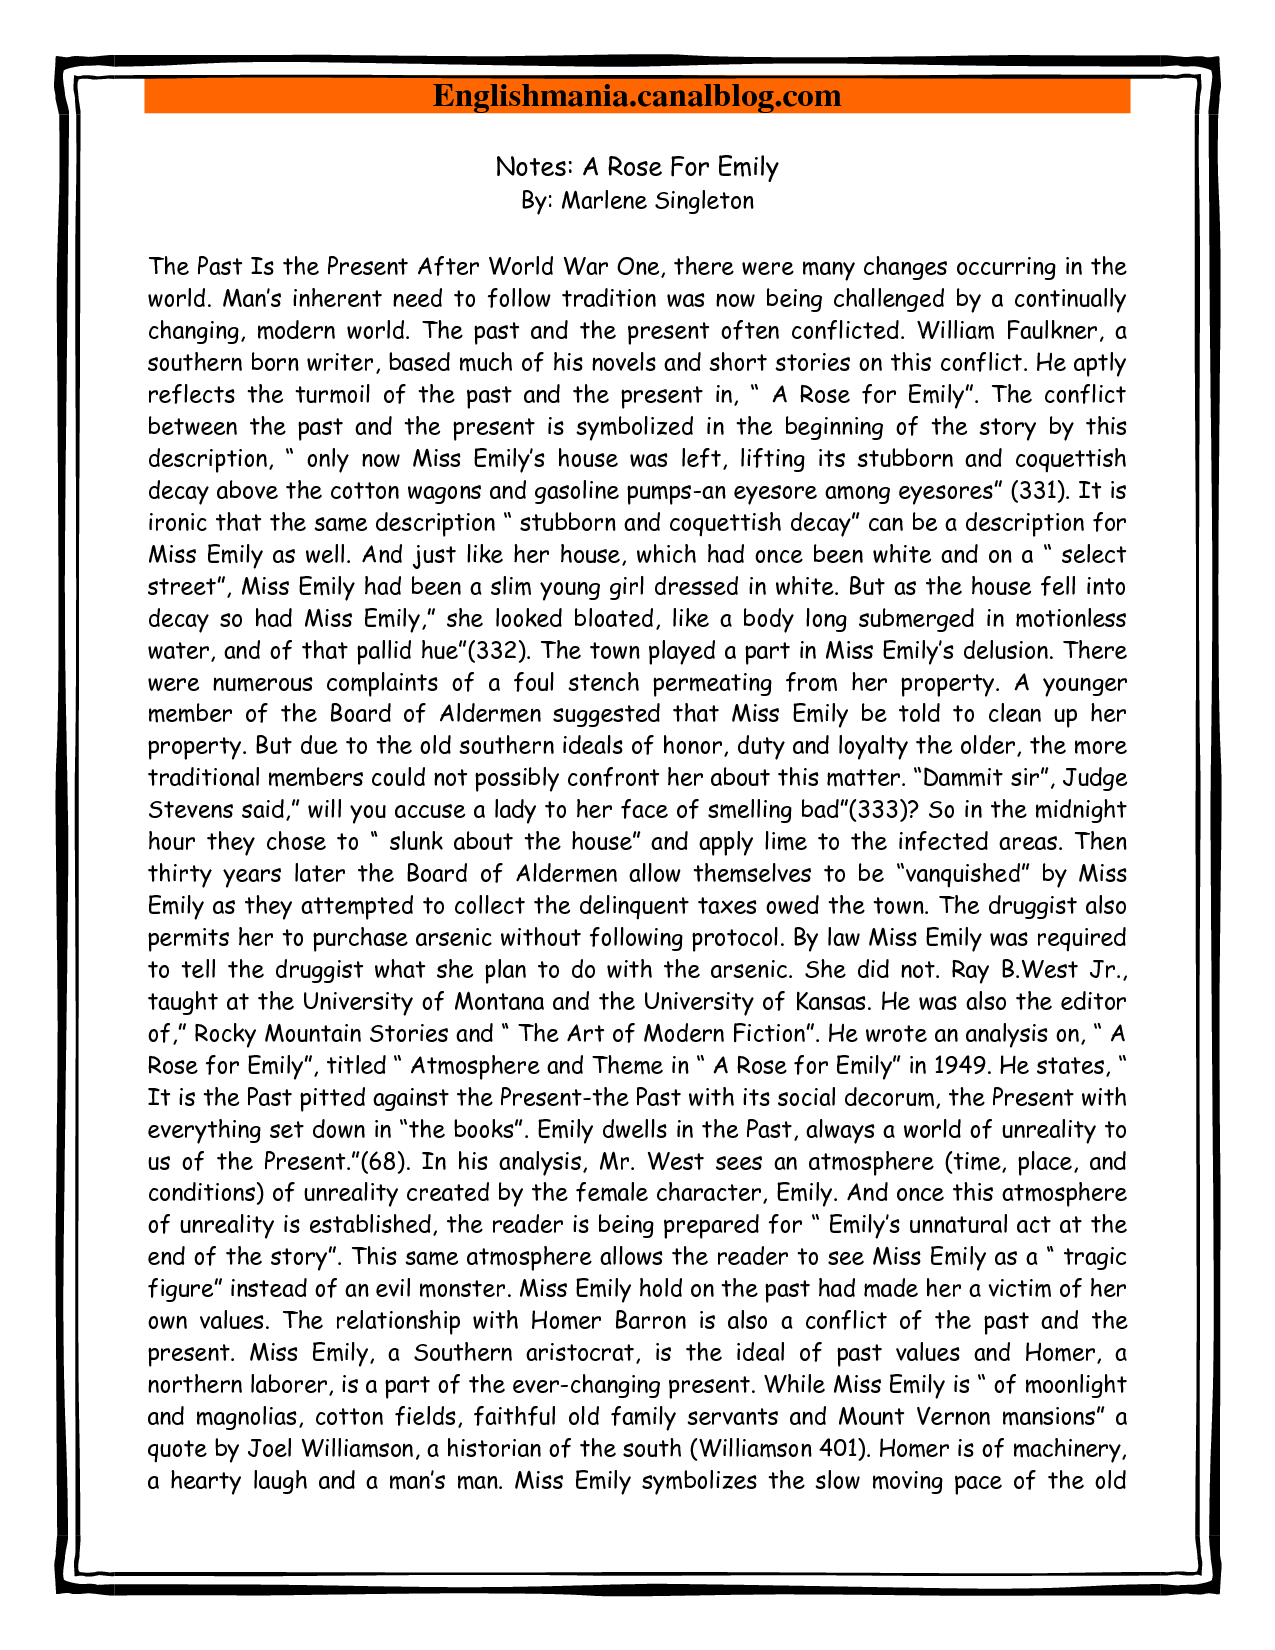 Tradition essay